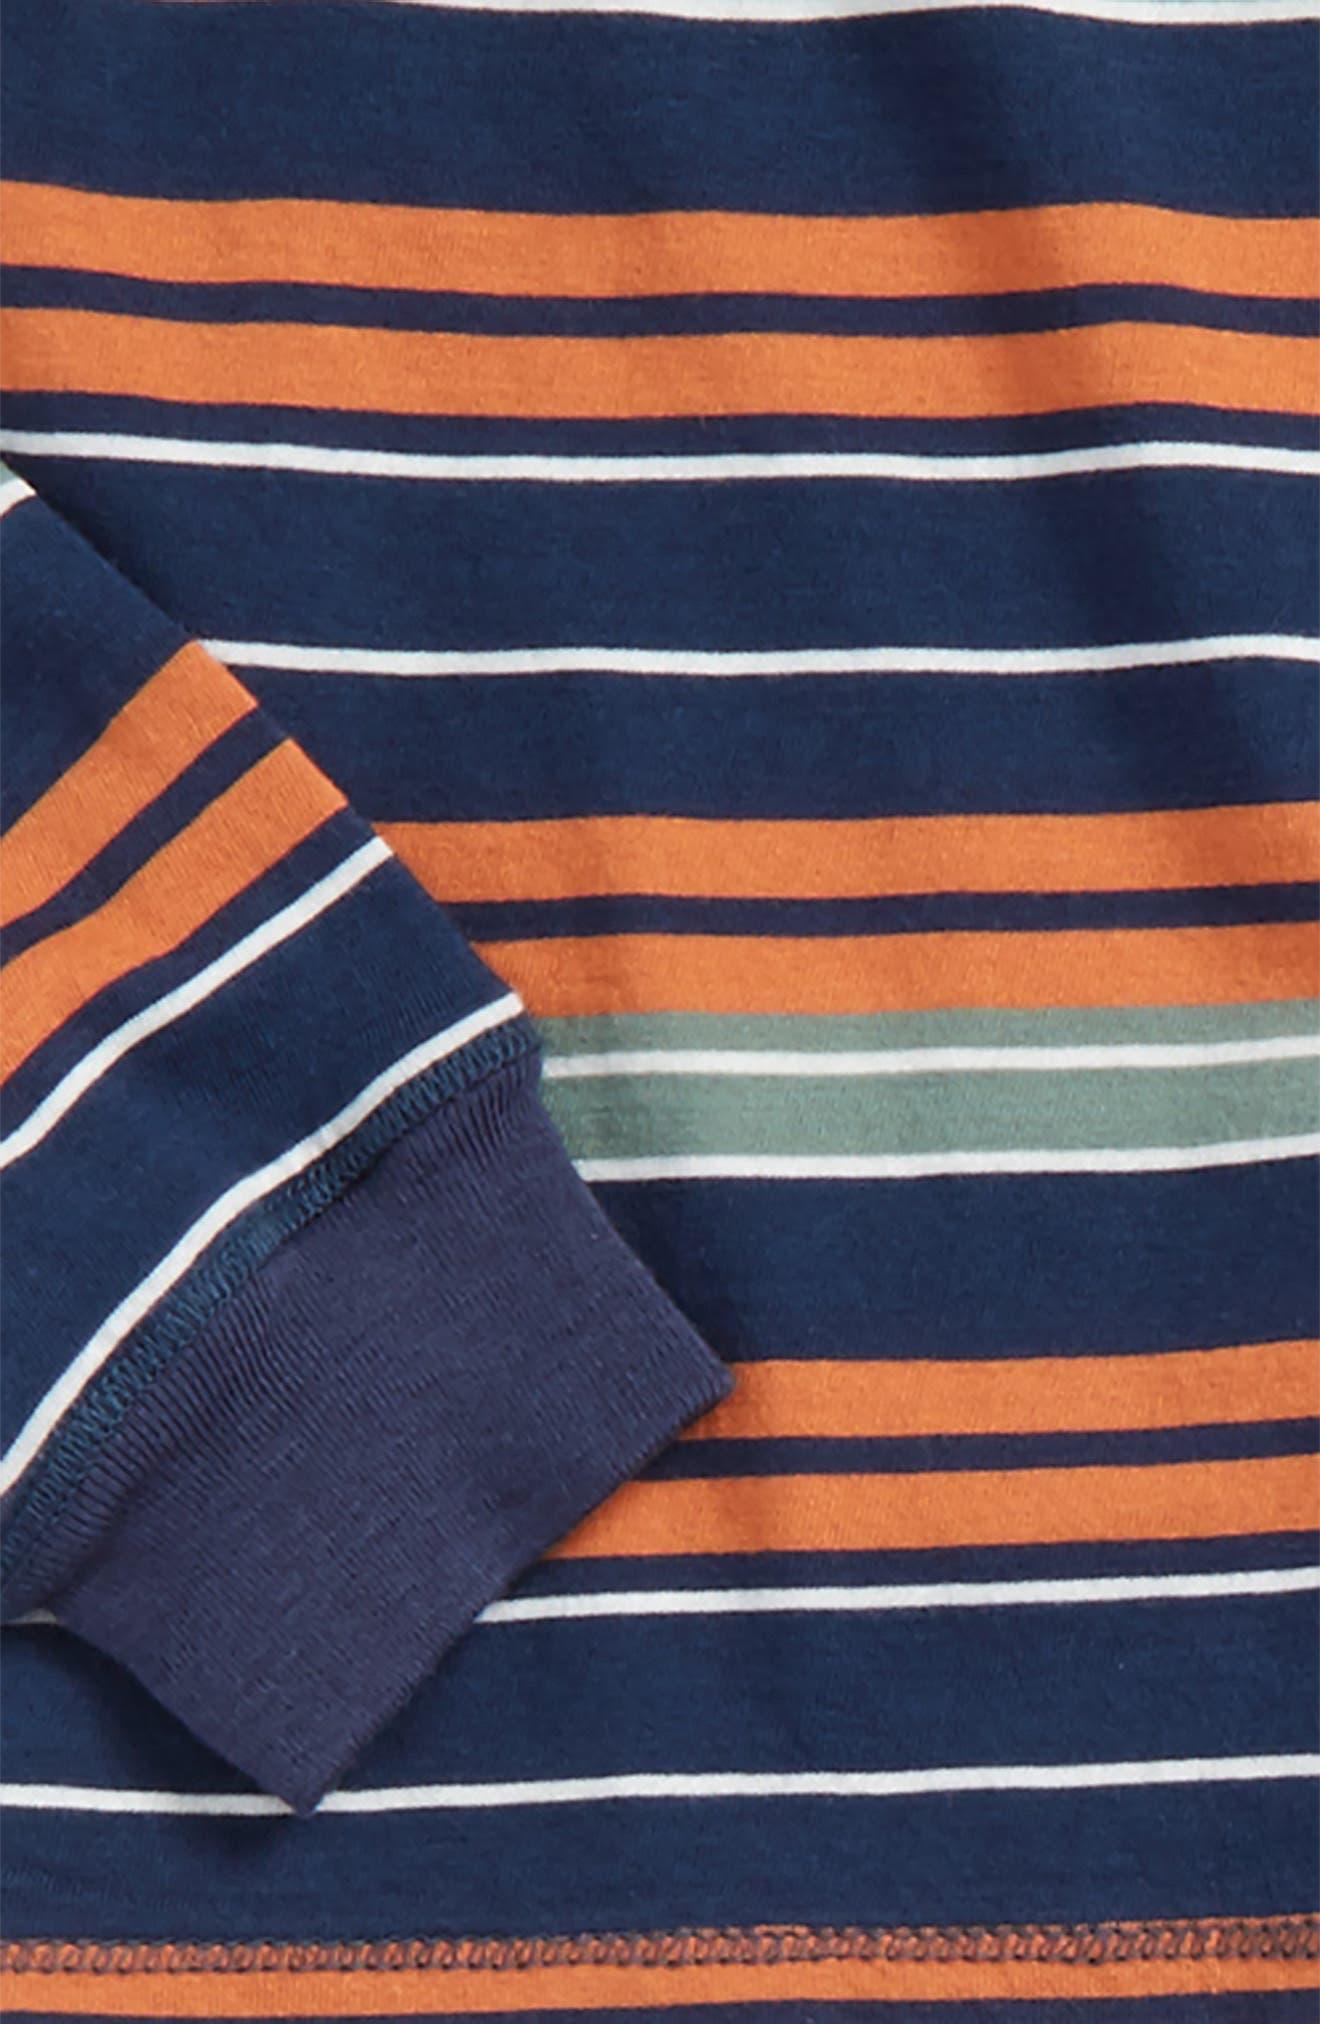 Stripe Henley Top & Sweatpants,                             Alternate thumbnail 2, color,                             400